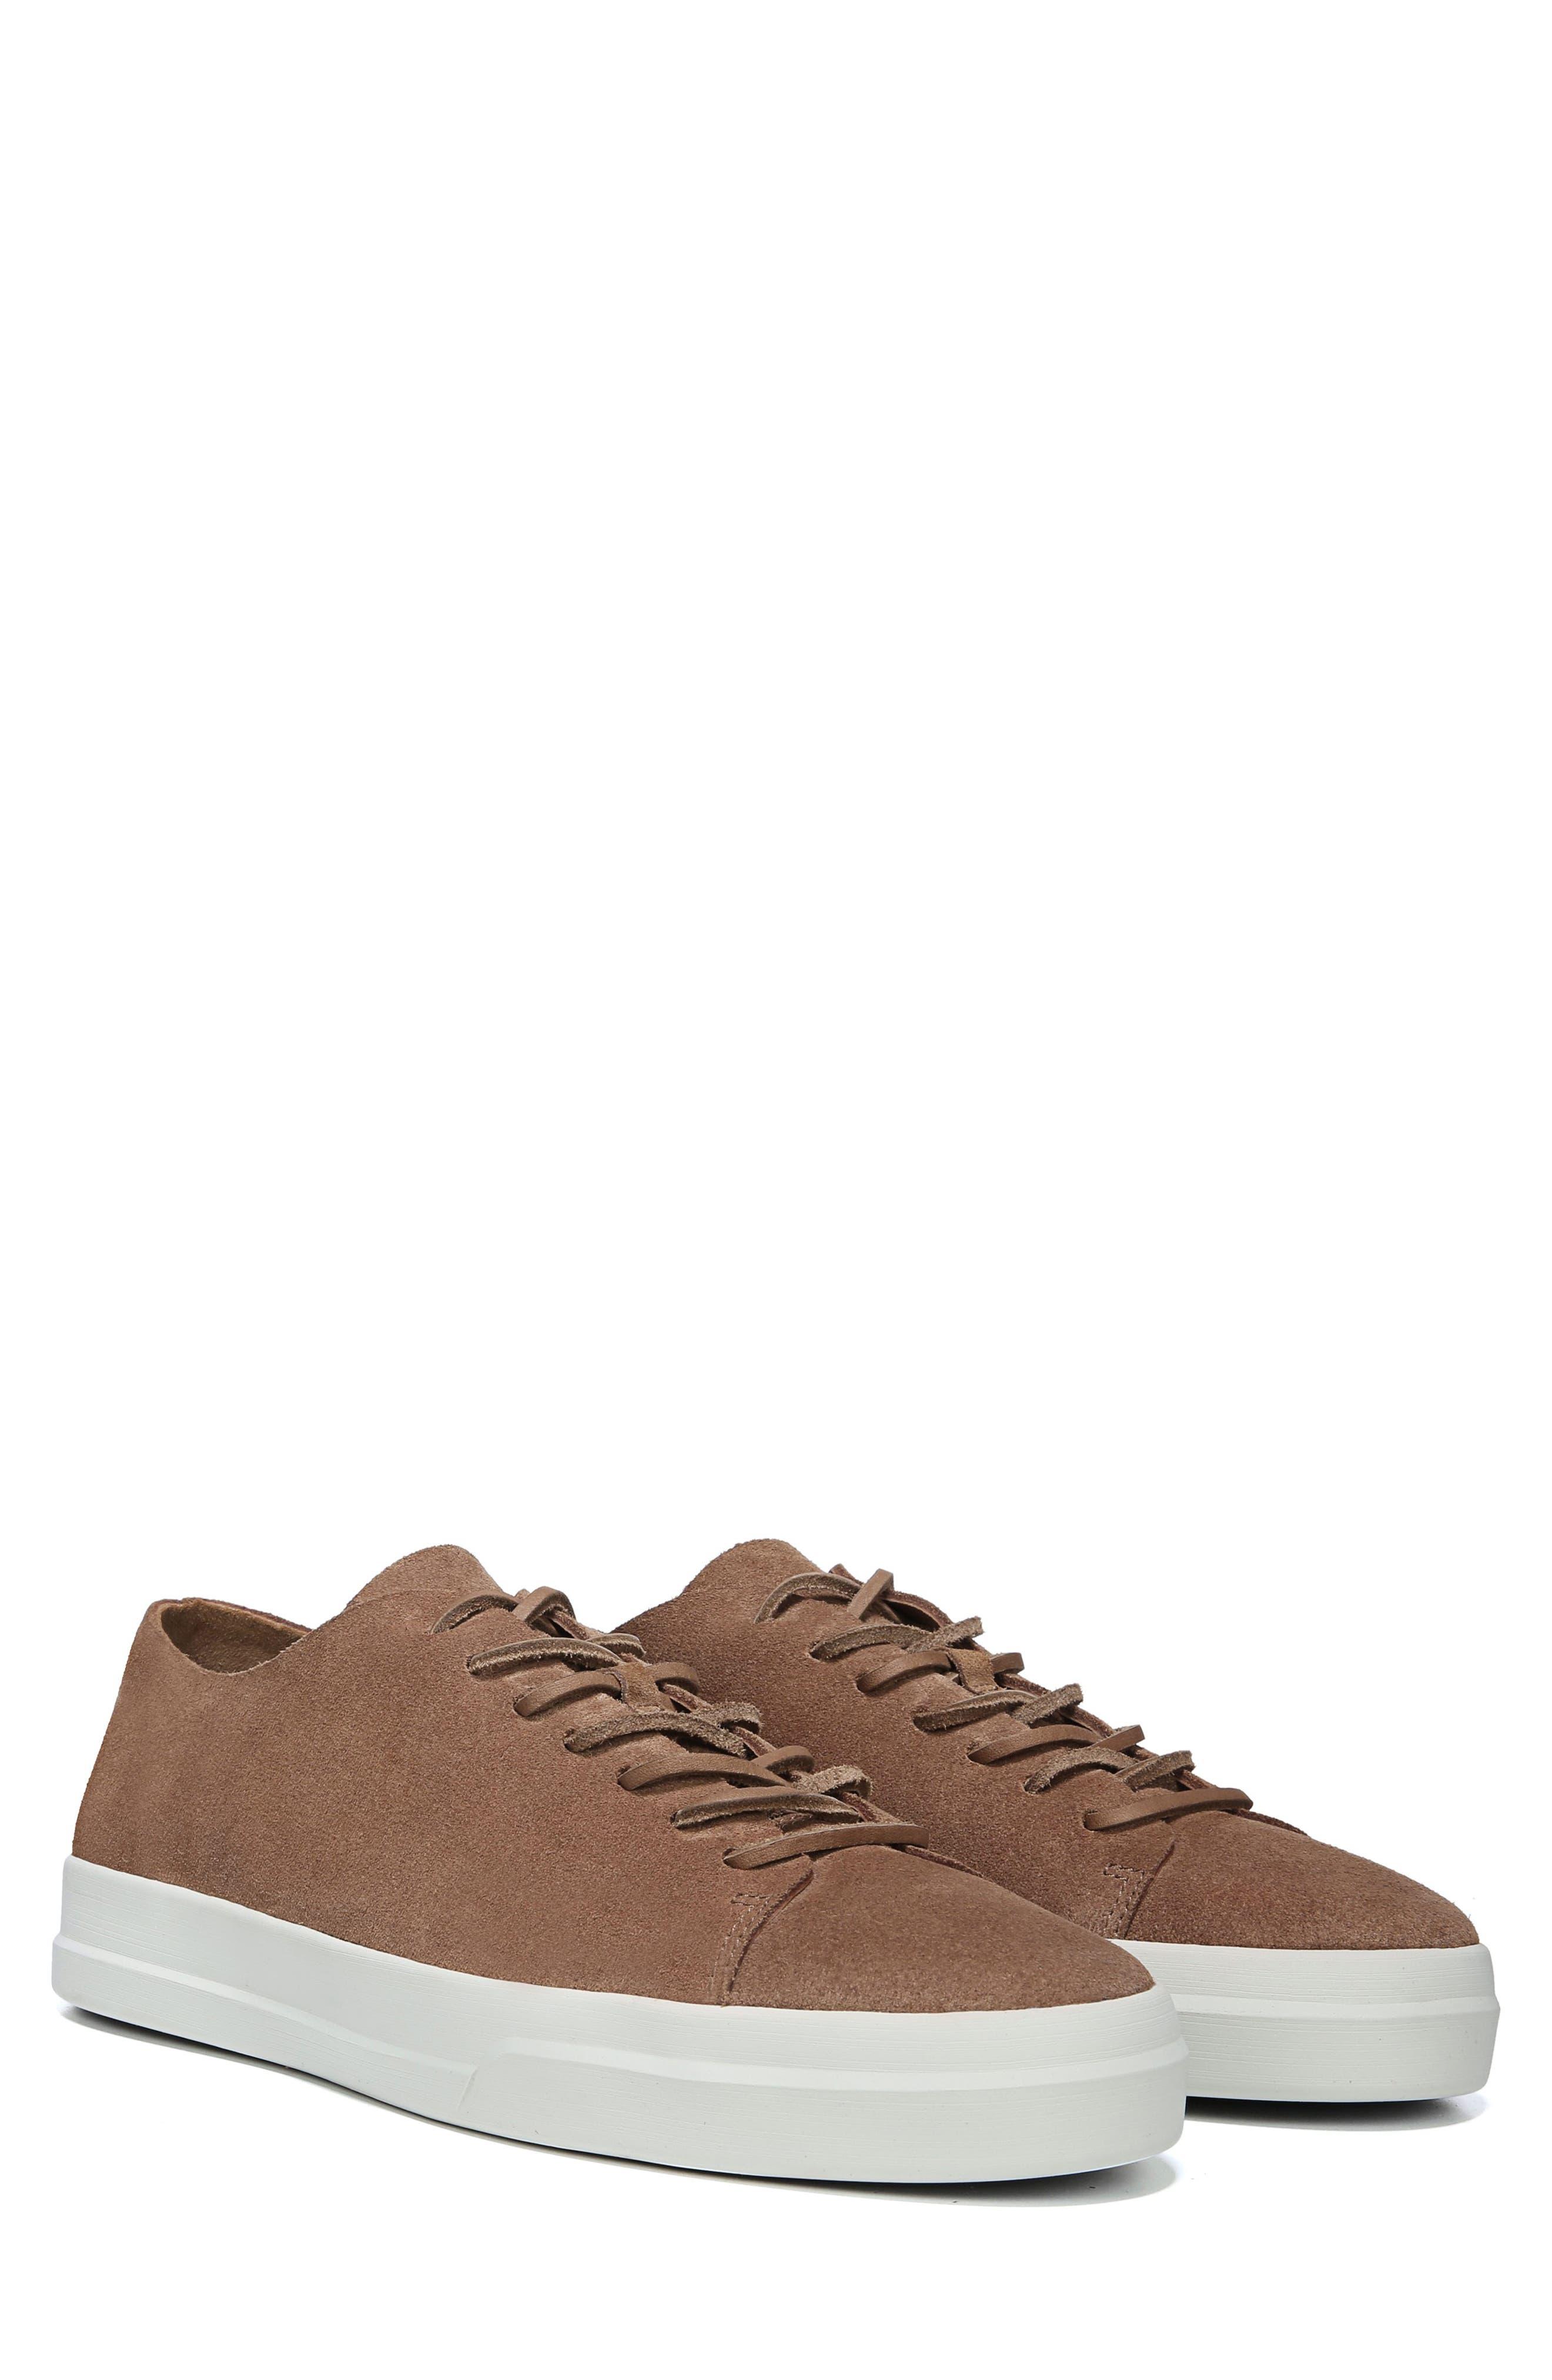 Copeland Sneaker,                             Alternate thumbnail 7, color,                             CEDAR